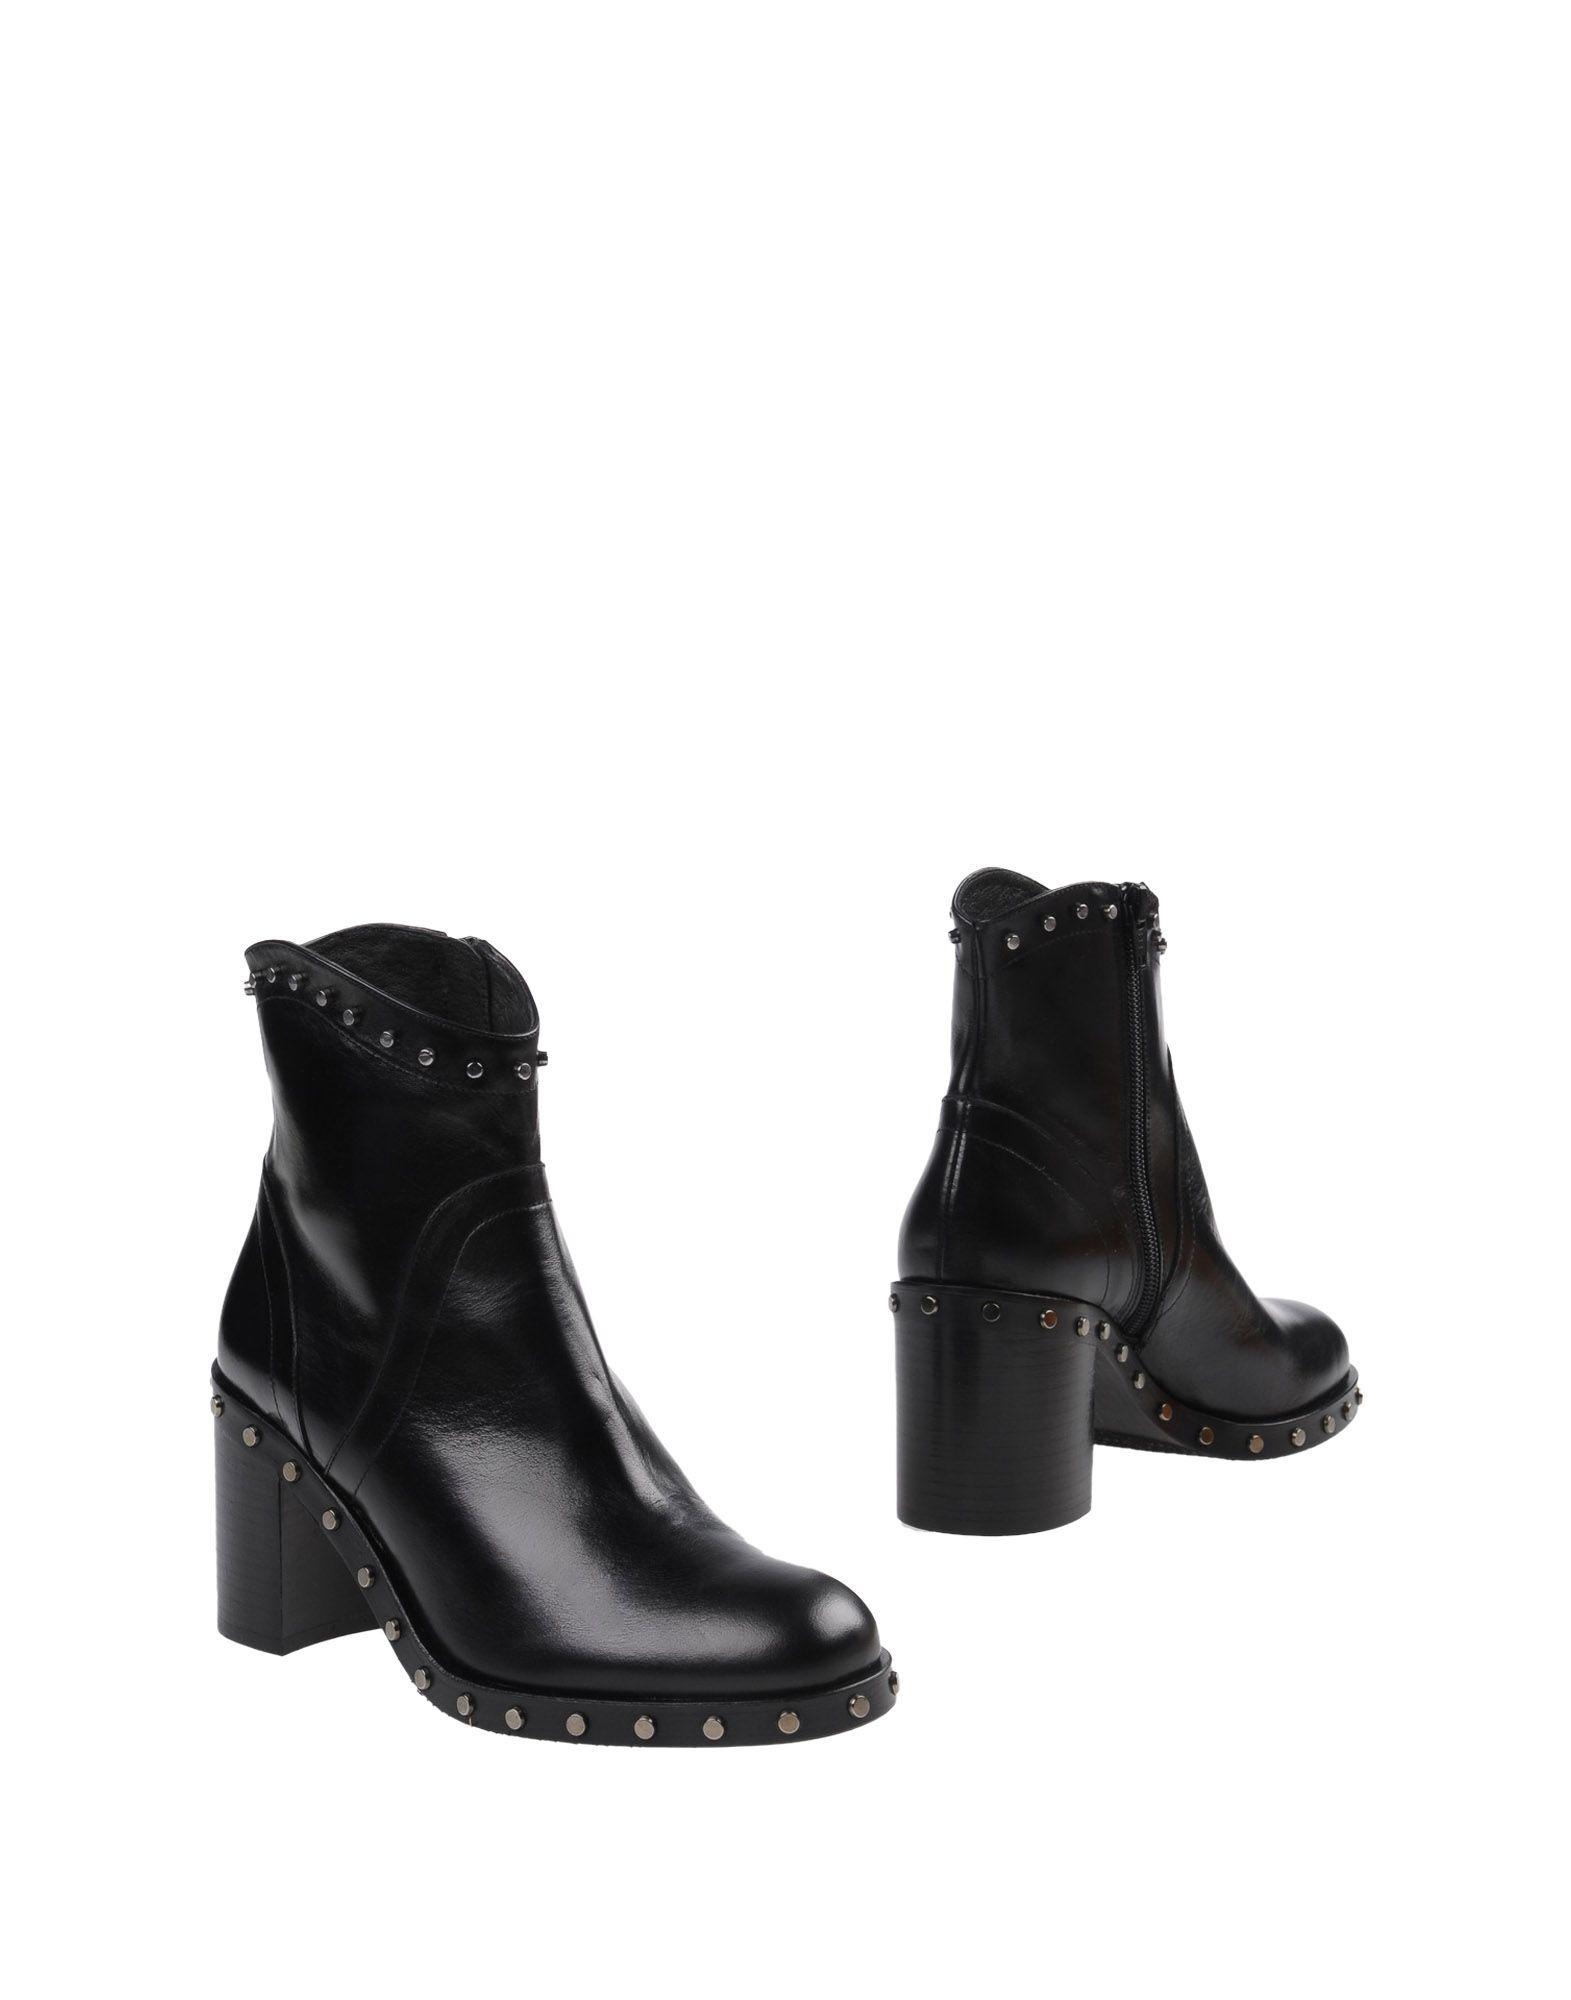 Bottine Zinda Femme - Bottines Zinda Noir Confortable et belle